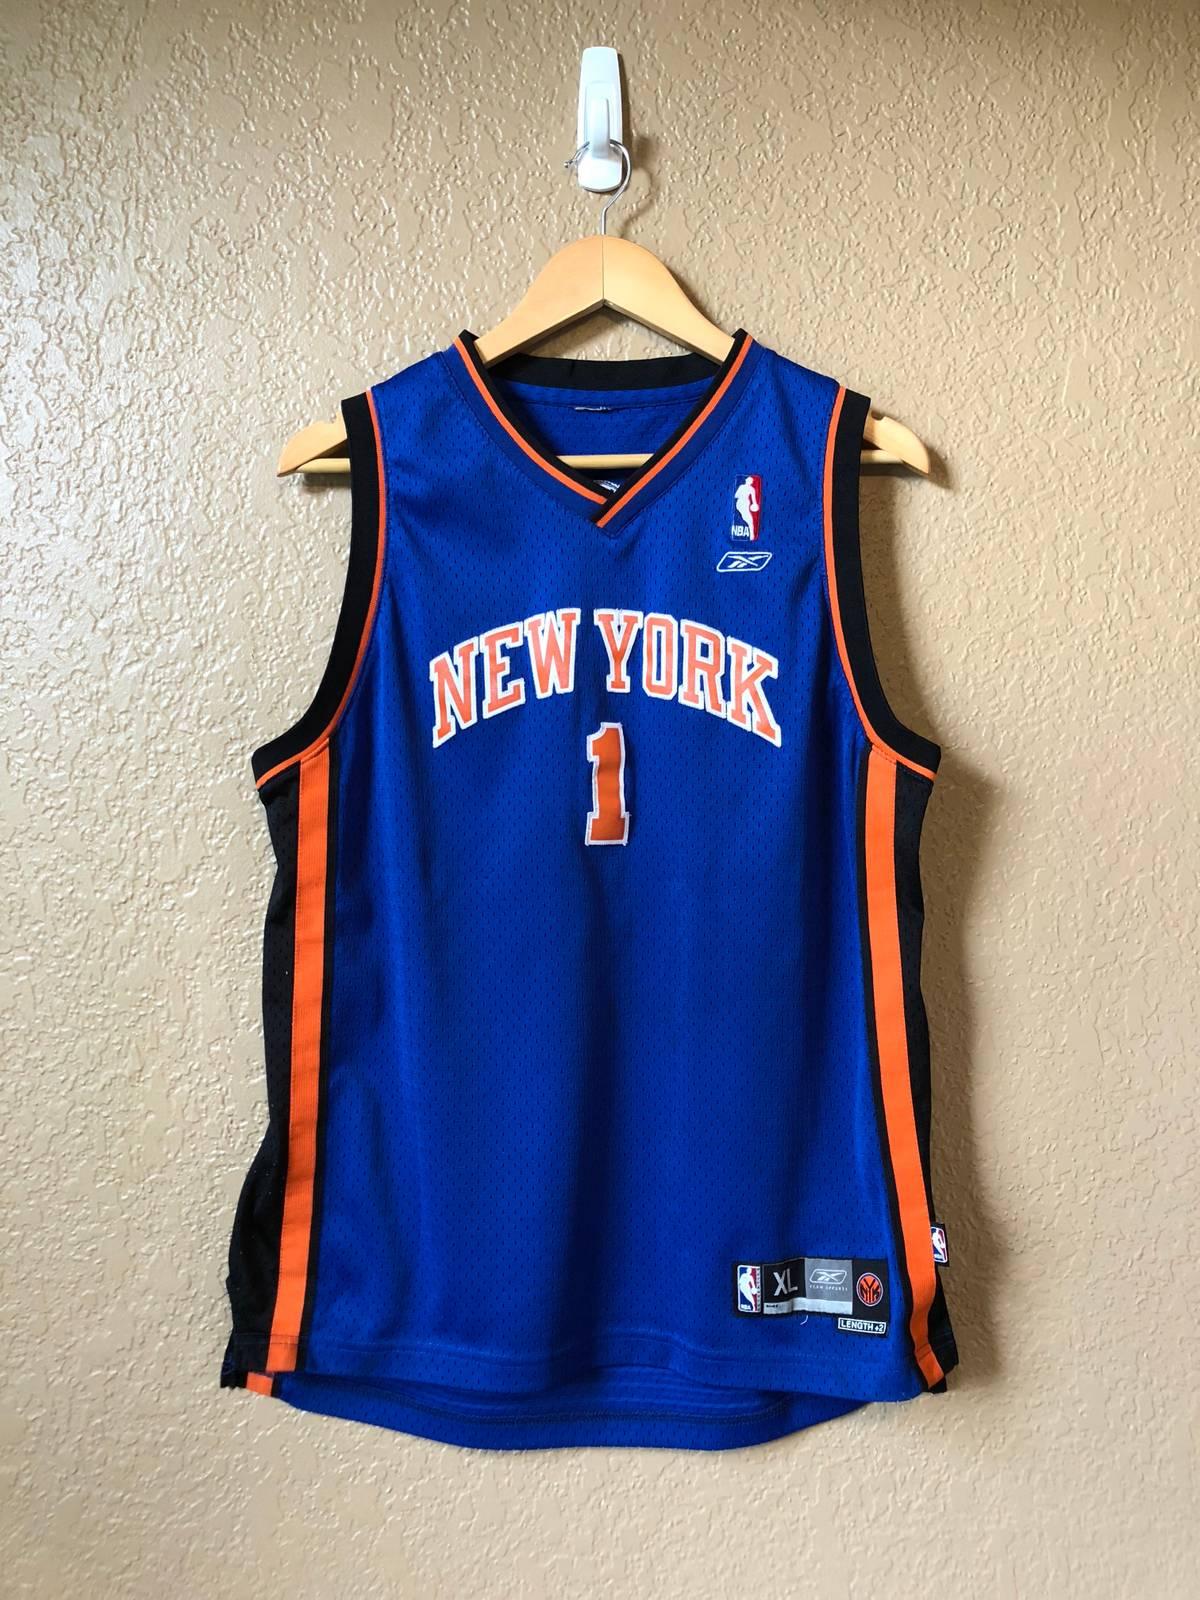 the best attitude 57c5b 1fdad Nba × Reebok × Vintage 2000s Steve Francis New York Knicks Jersey Size S $1